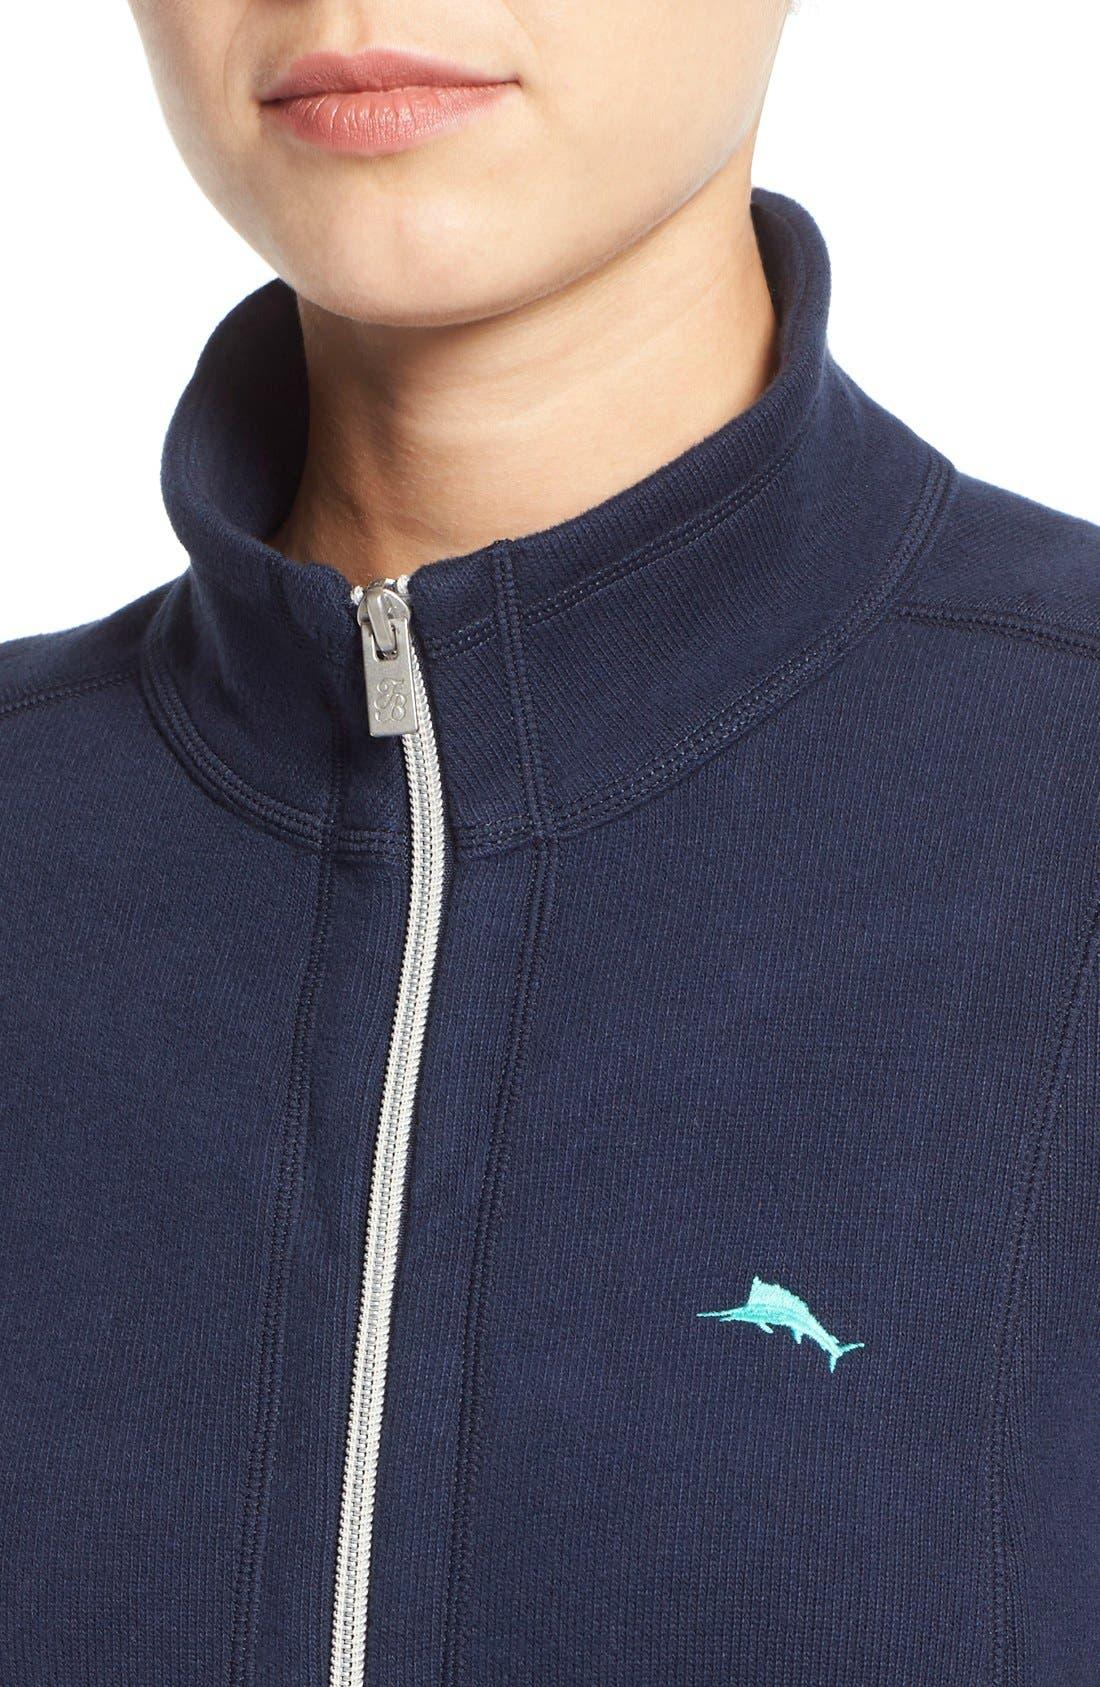 'Aruba' Full Zip Sweatshirt,                             Alternate thumbnail 20, color,